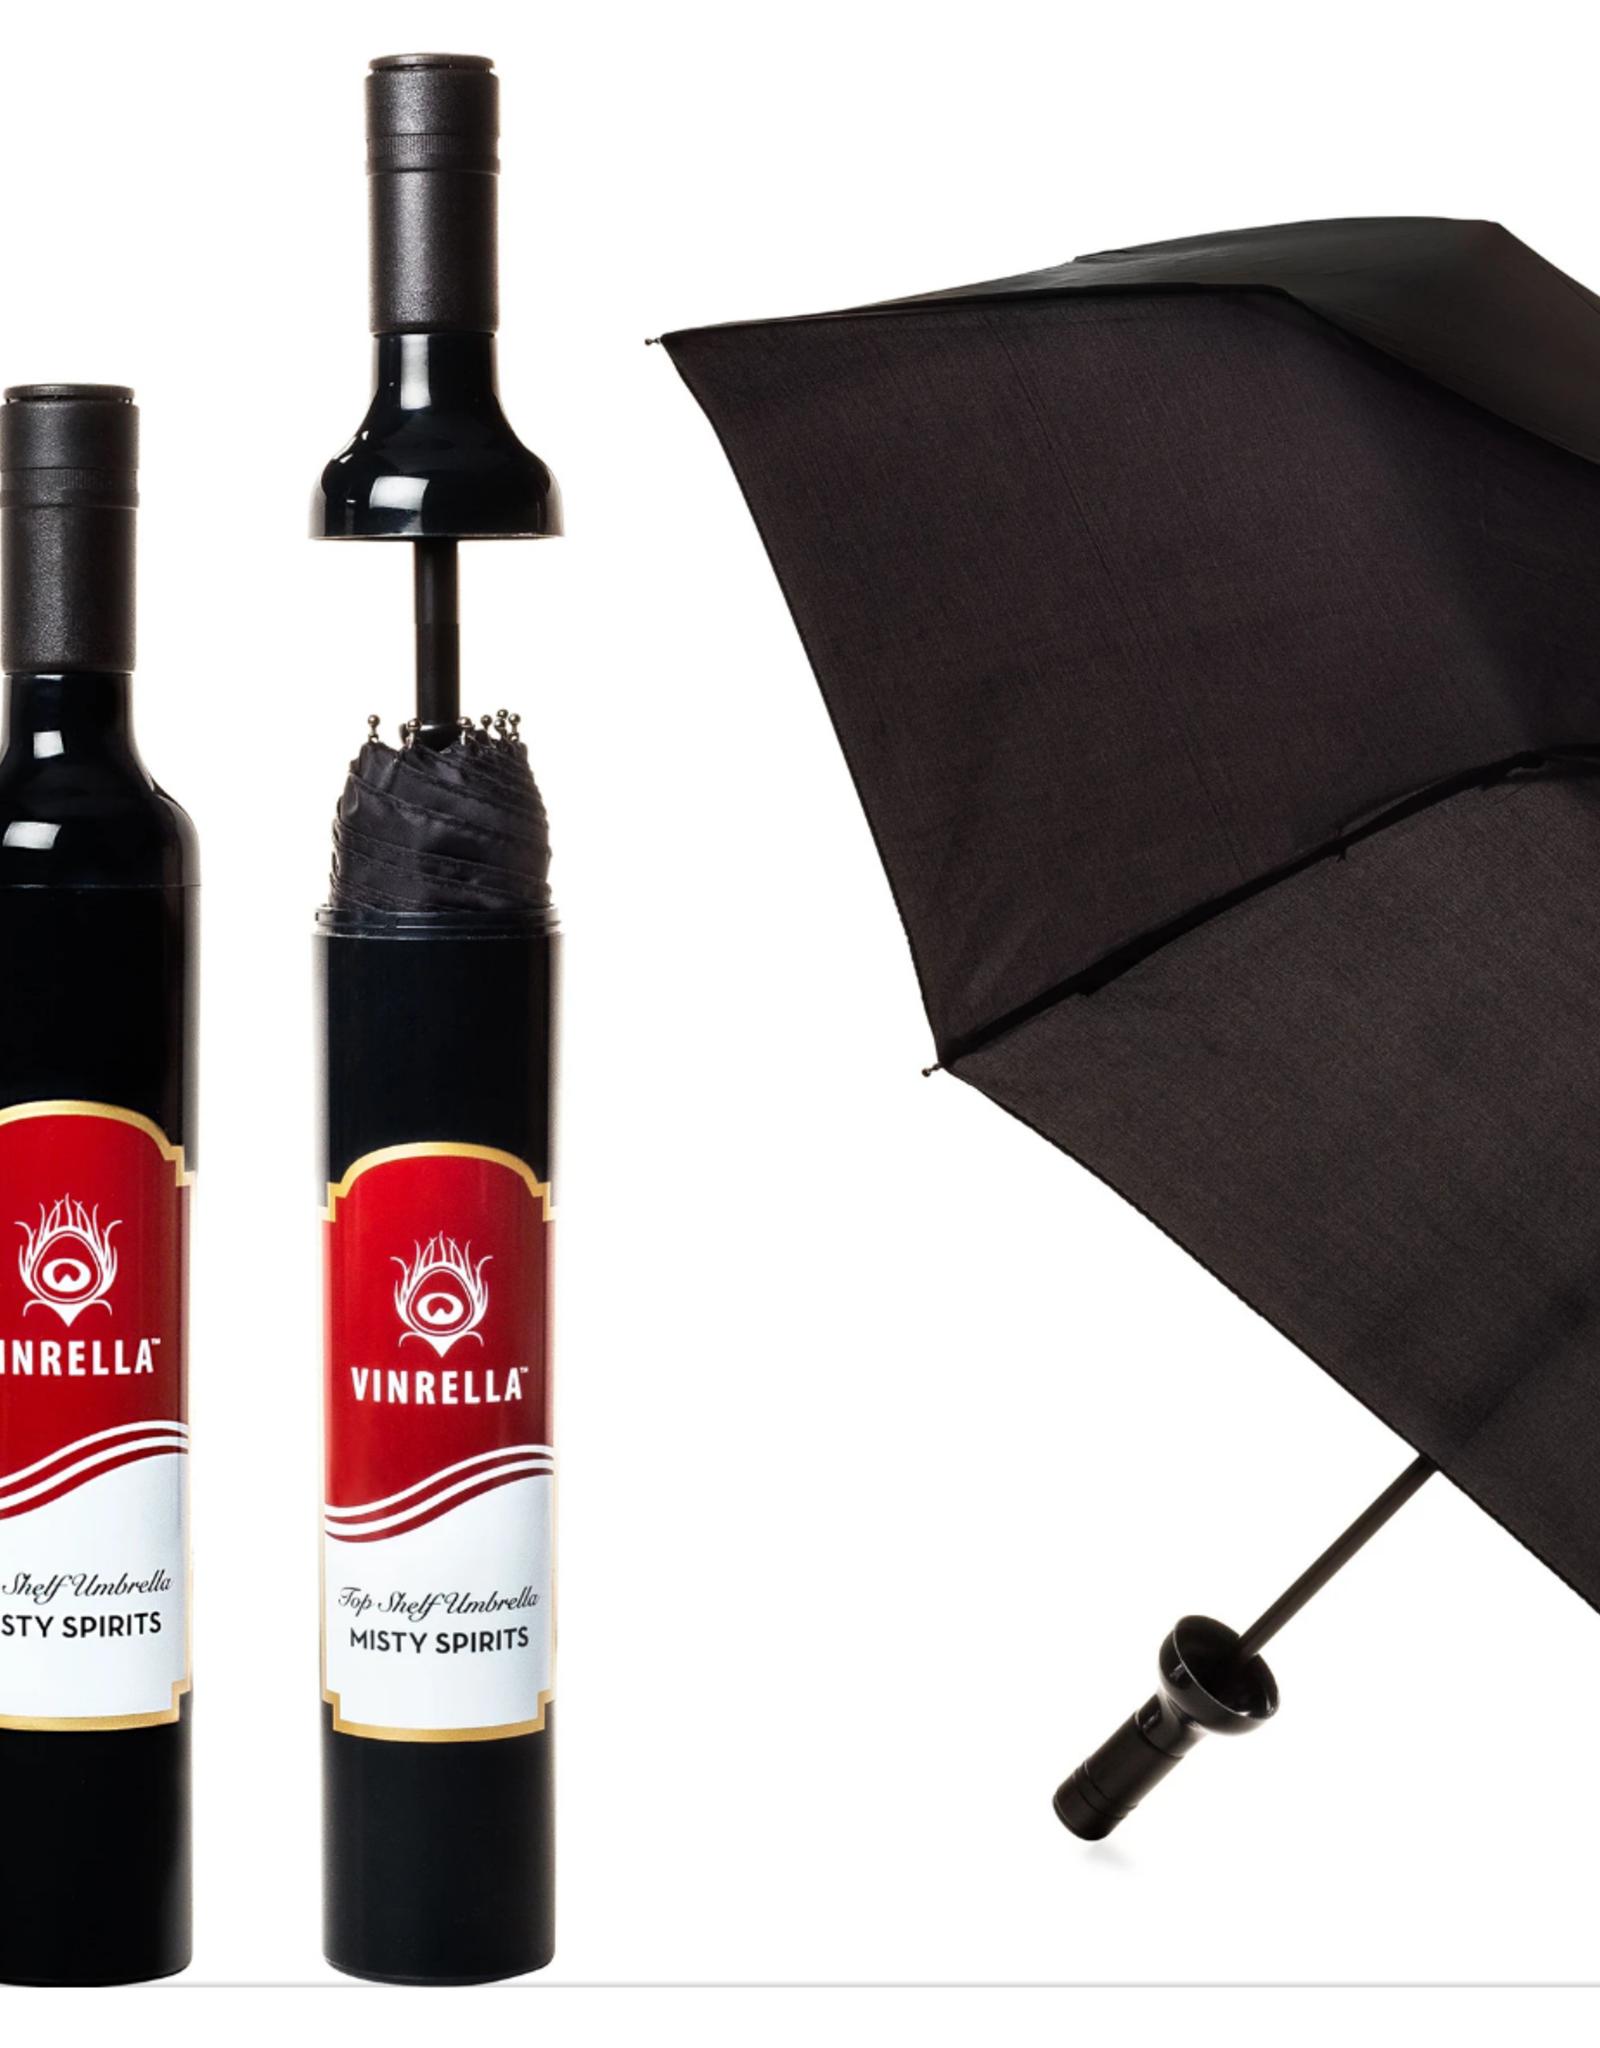 Vinrella Wine Bottle Misty Spirits Umbrella